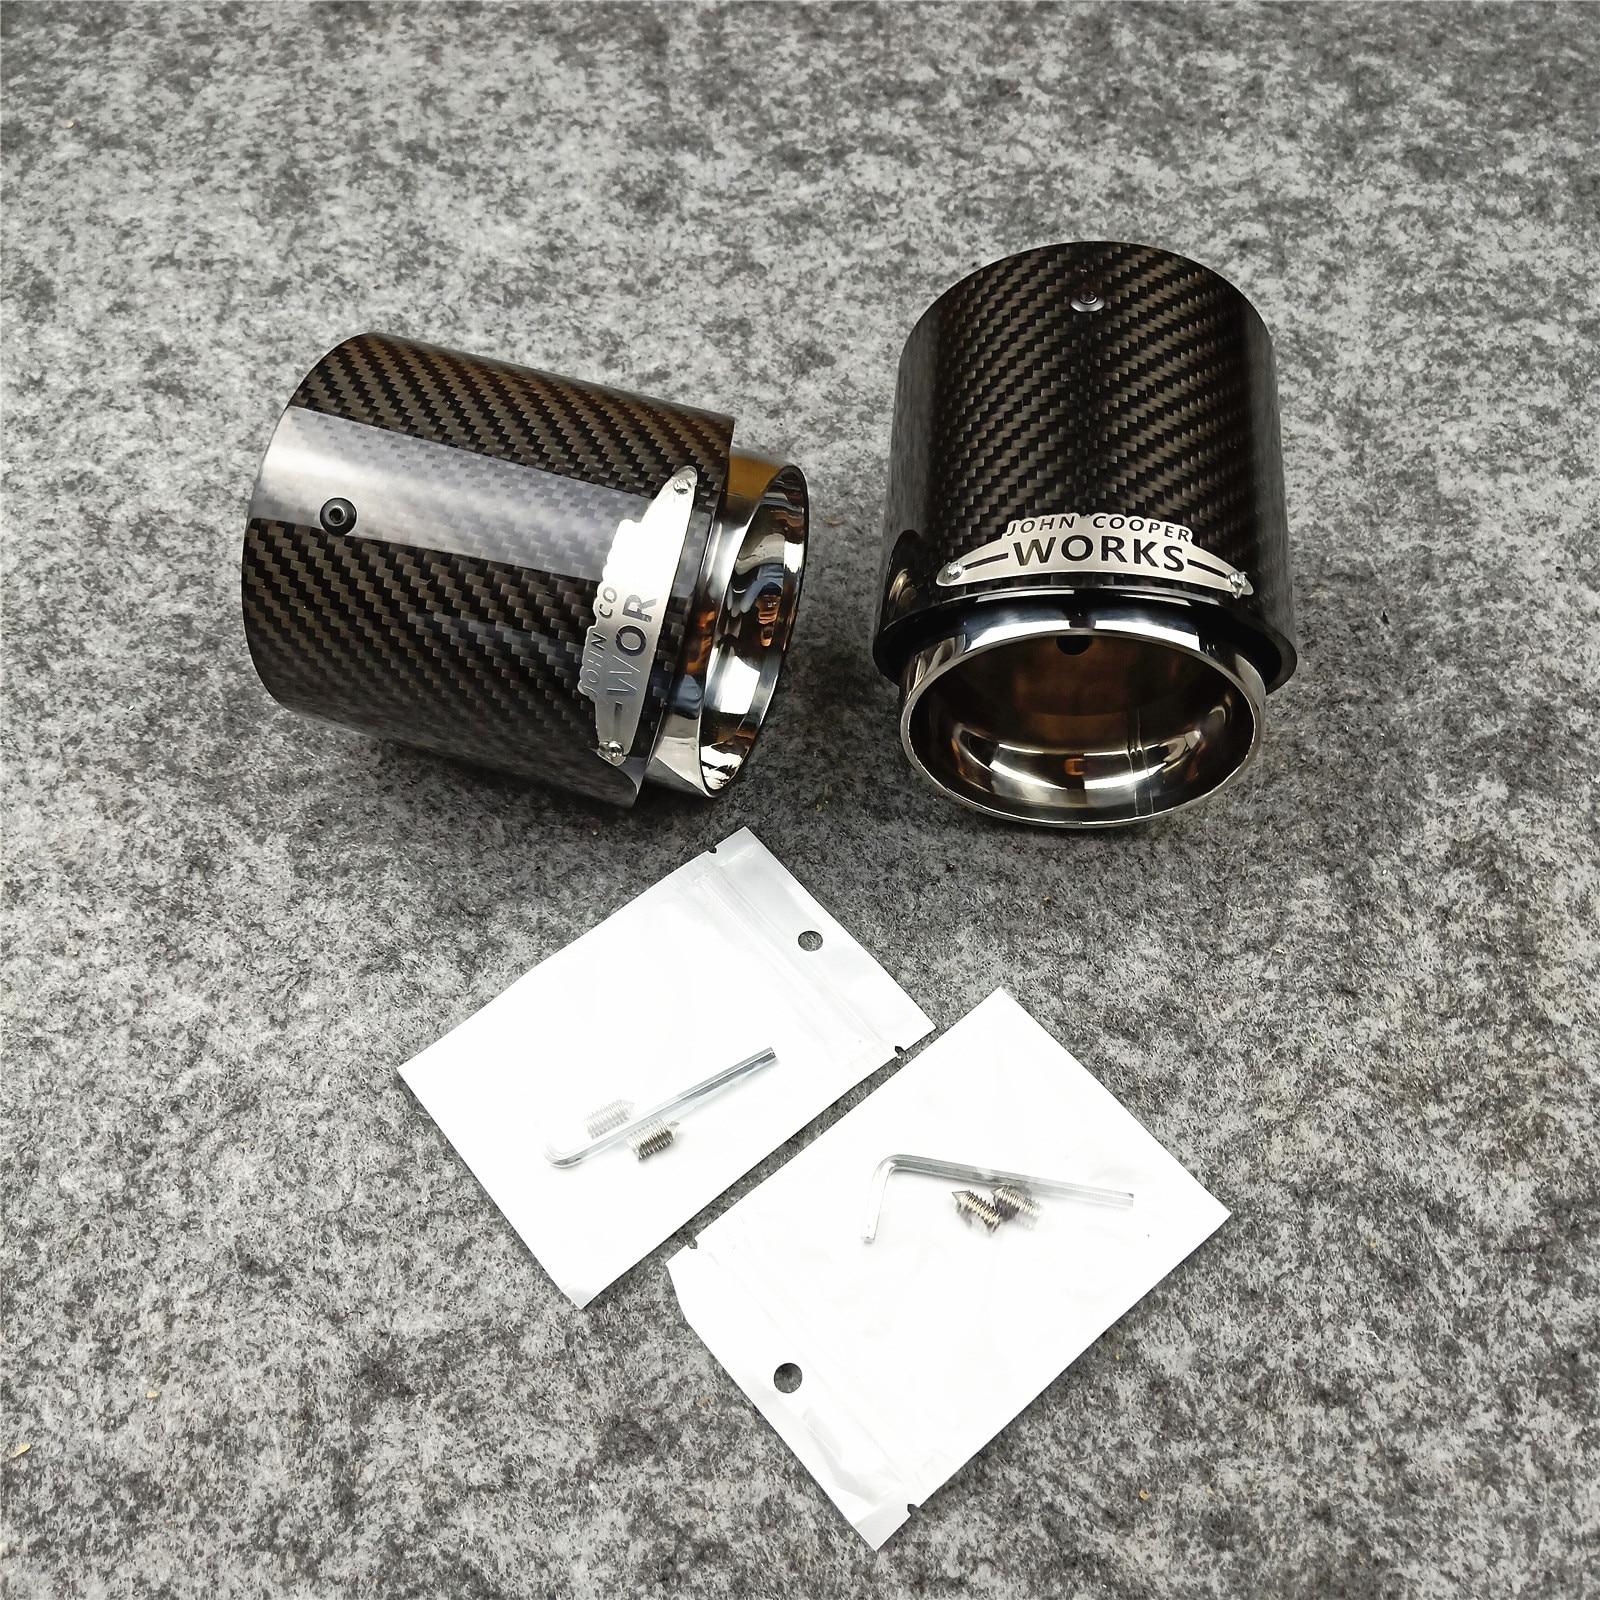 1 PCS 3K Carbon Top Quality Exhaust Muffler Tips for MINI Cooper S  R55 R56 R57 R58 R59 R60 R61 F54 F56 F57 F60Exhaust